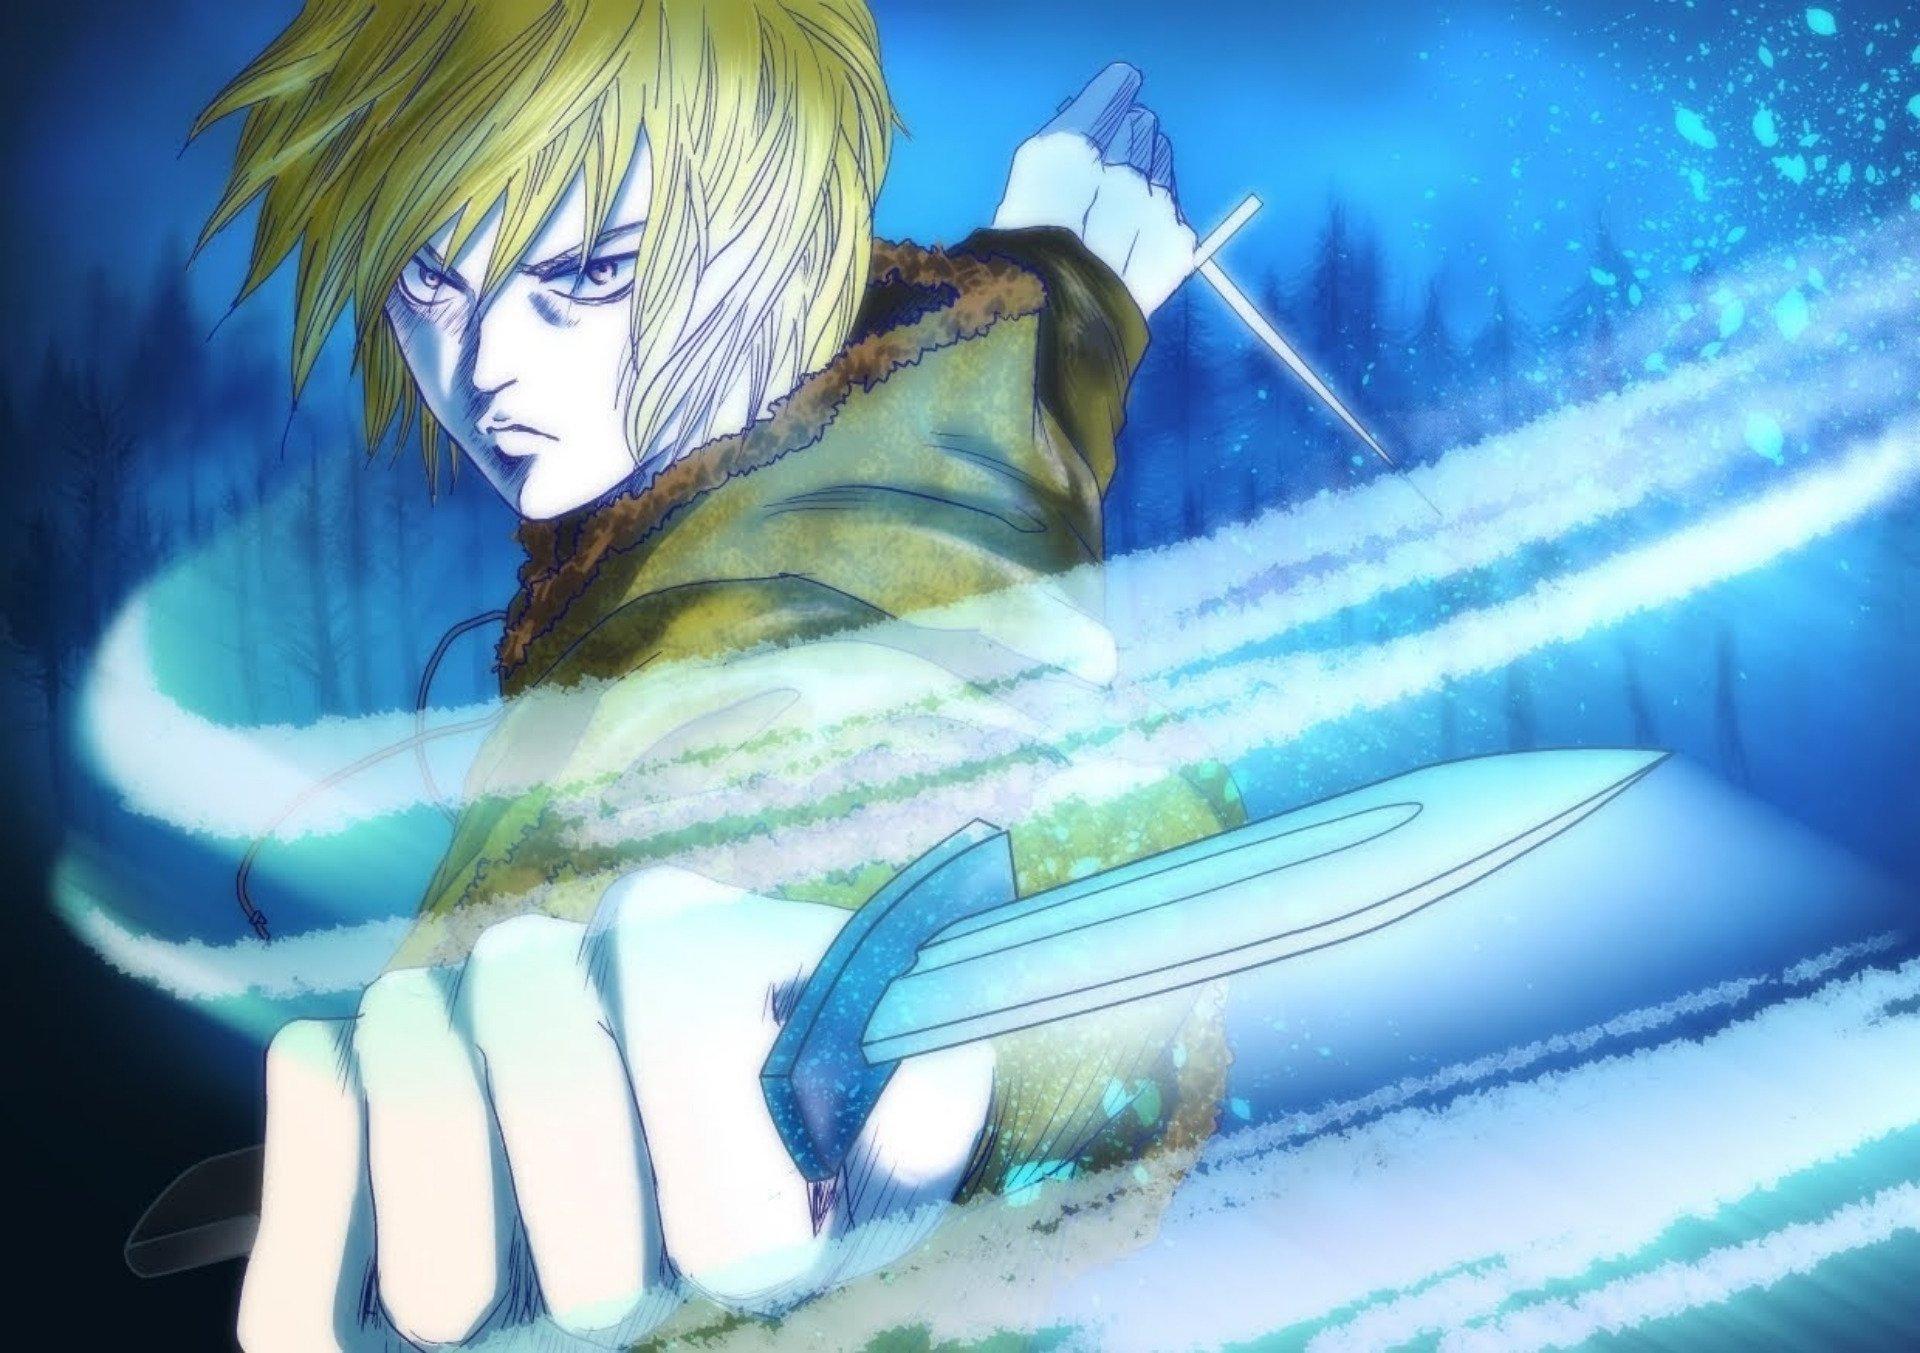 Anime 1920x1353 anime Vinland Saga anime boys weapon cyan blue knife